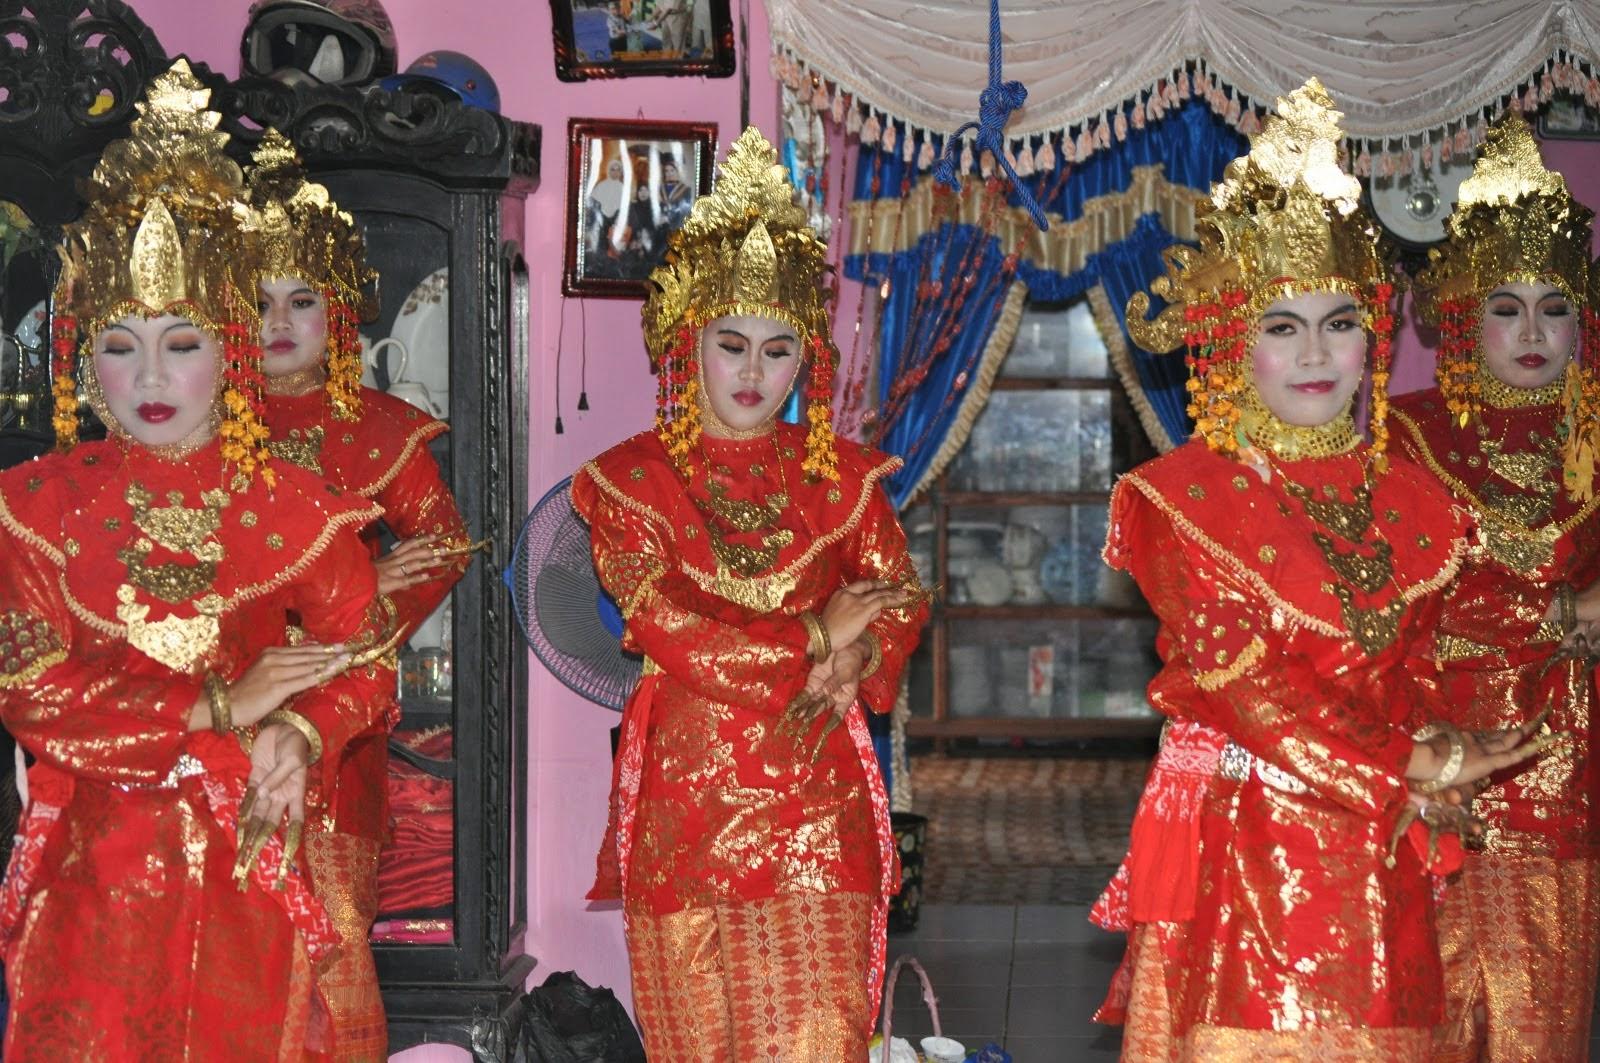 Unsur-Unsur Estetis Tari Tanggai | Sumatera Selatan